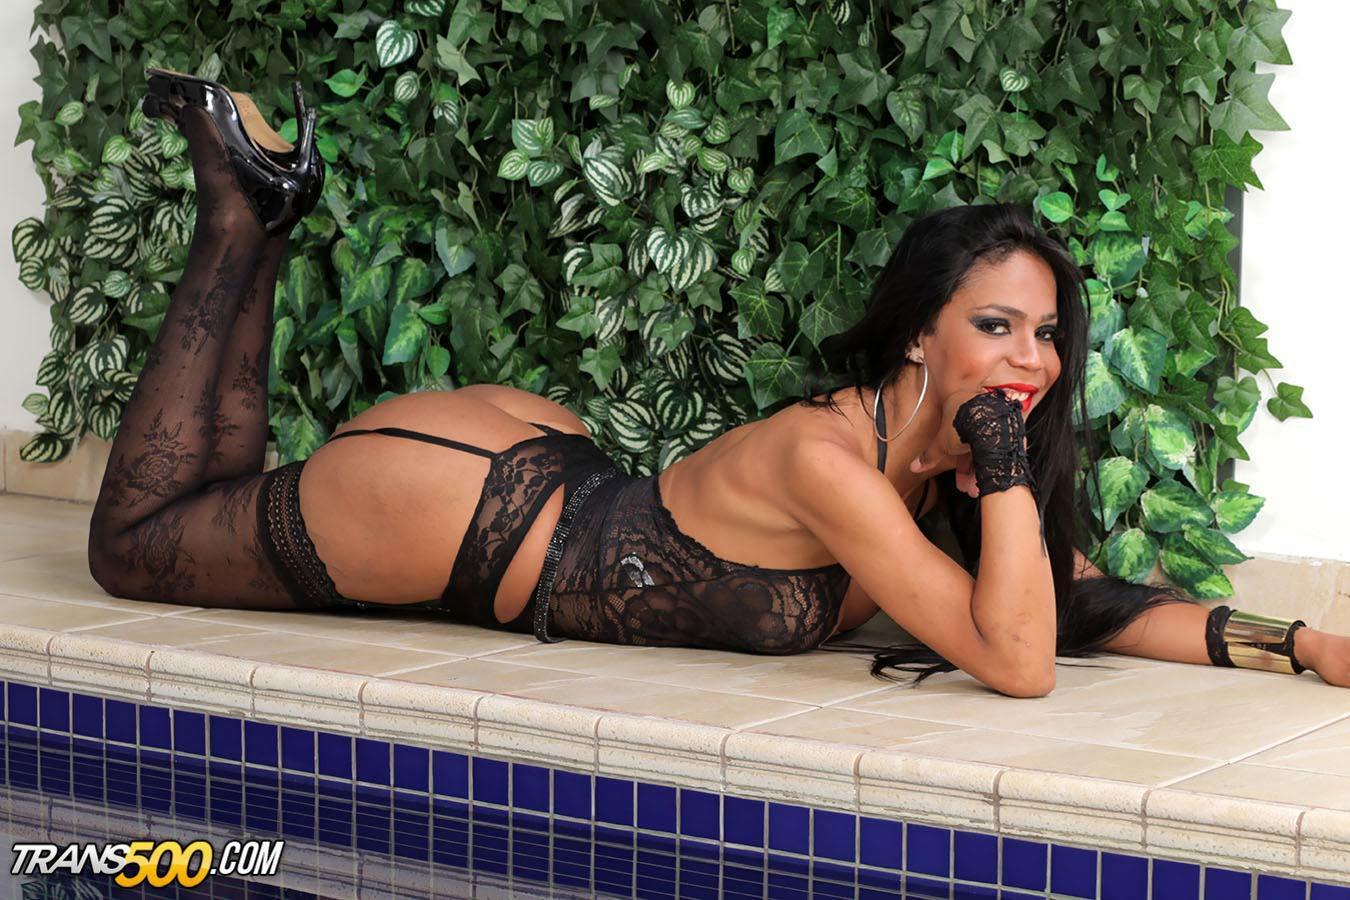 Watch Gorgeous Shemale Mirella Arango Take In Massive Cock!